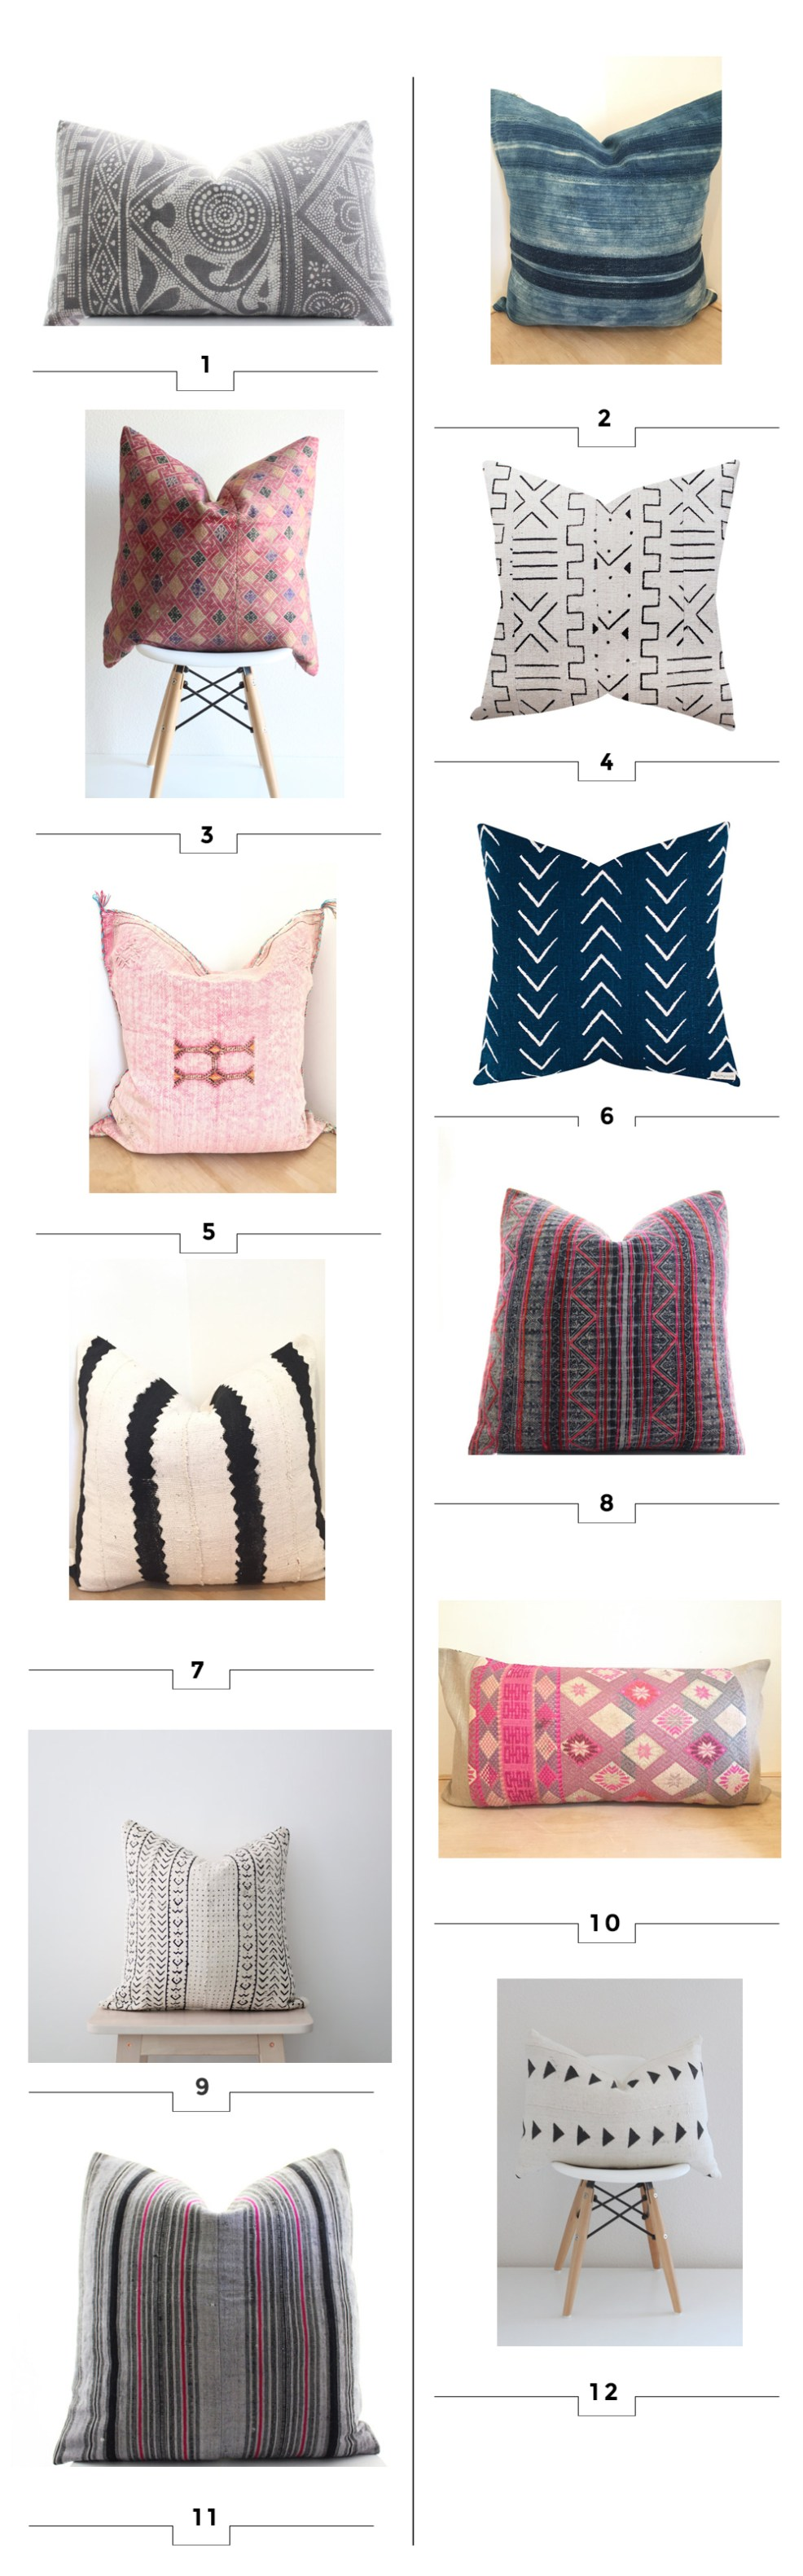 12 favorite boho style pillows